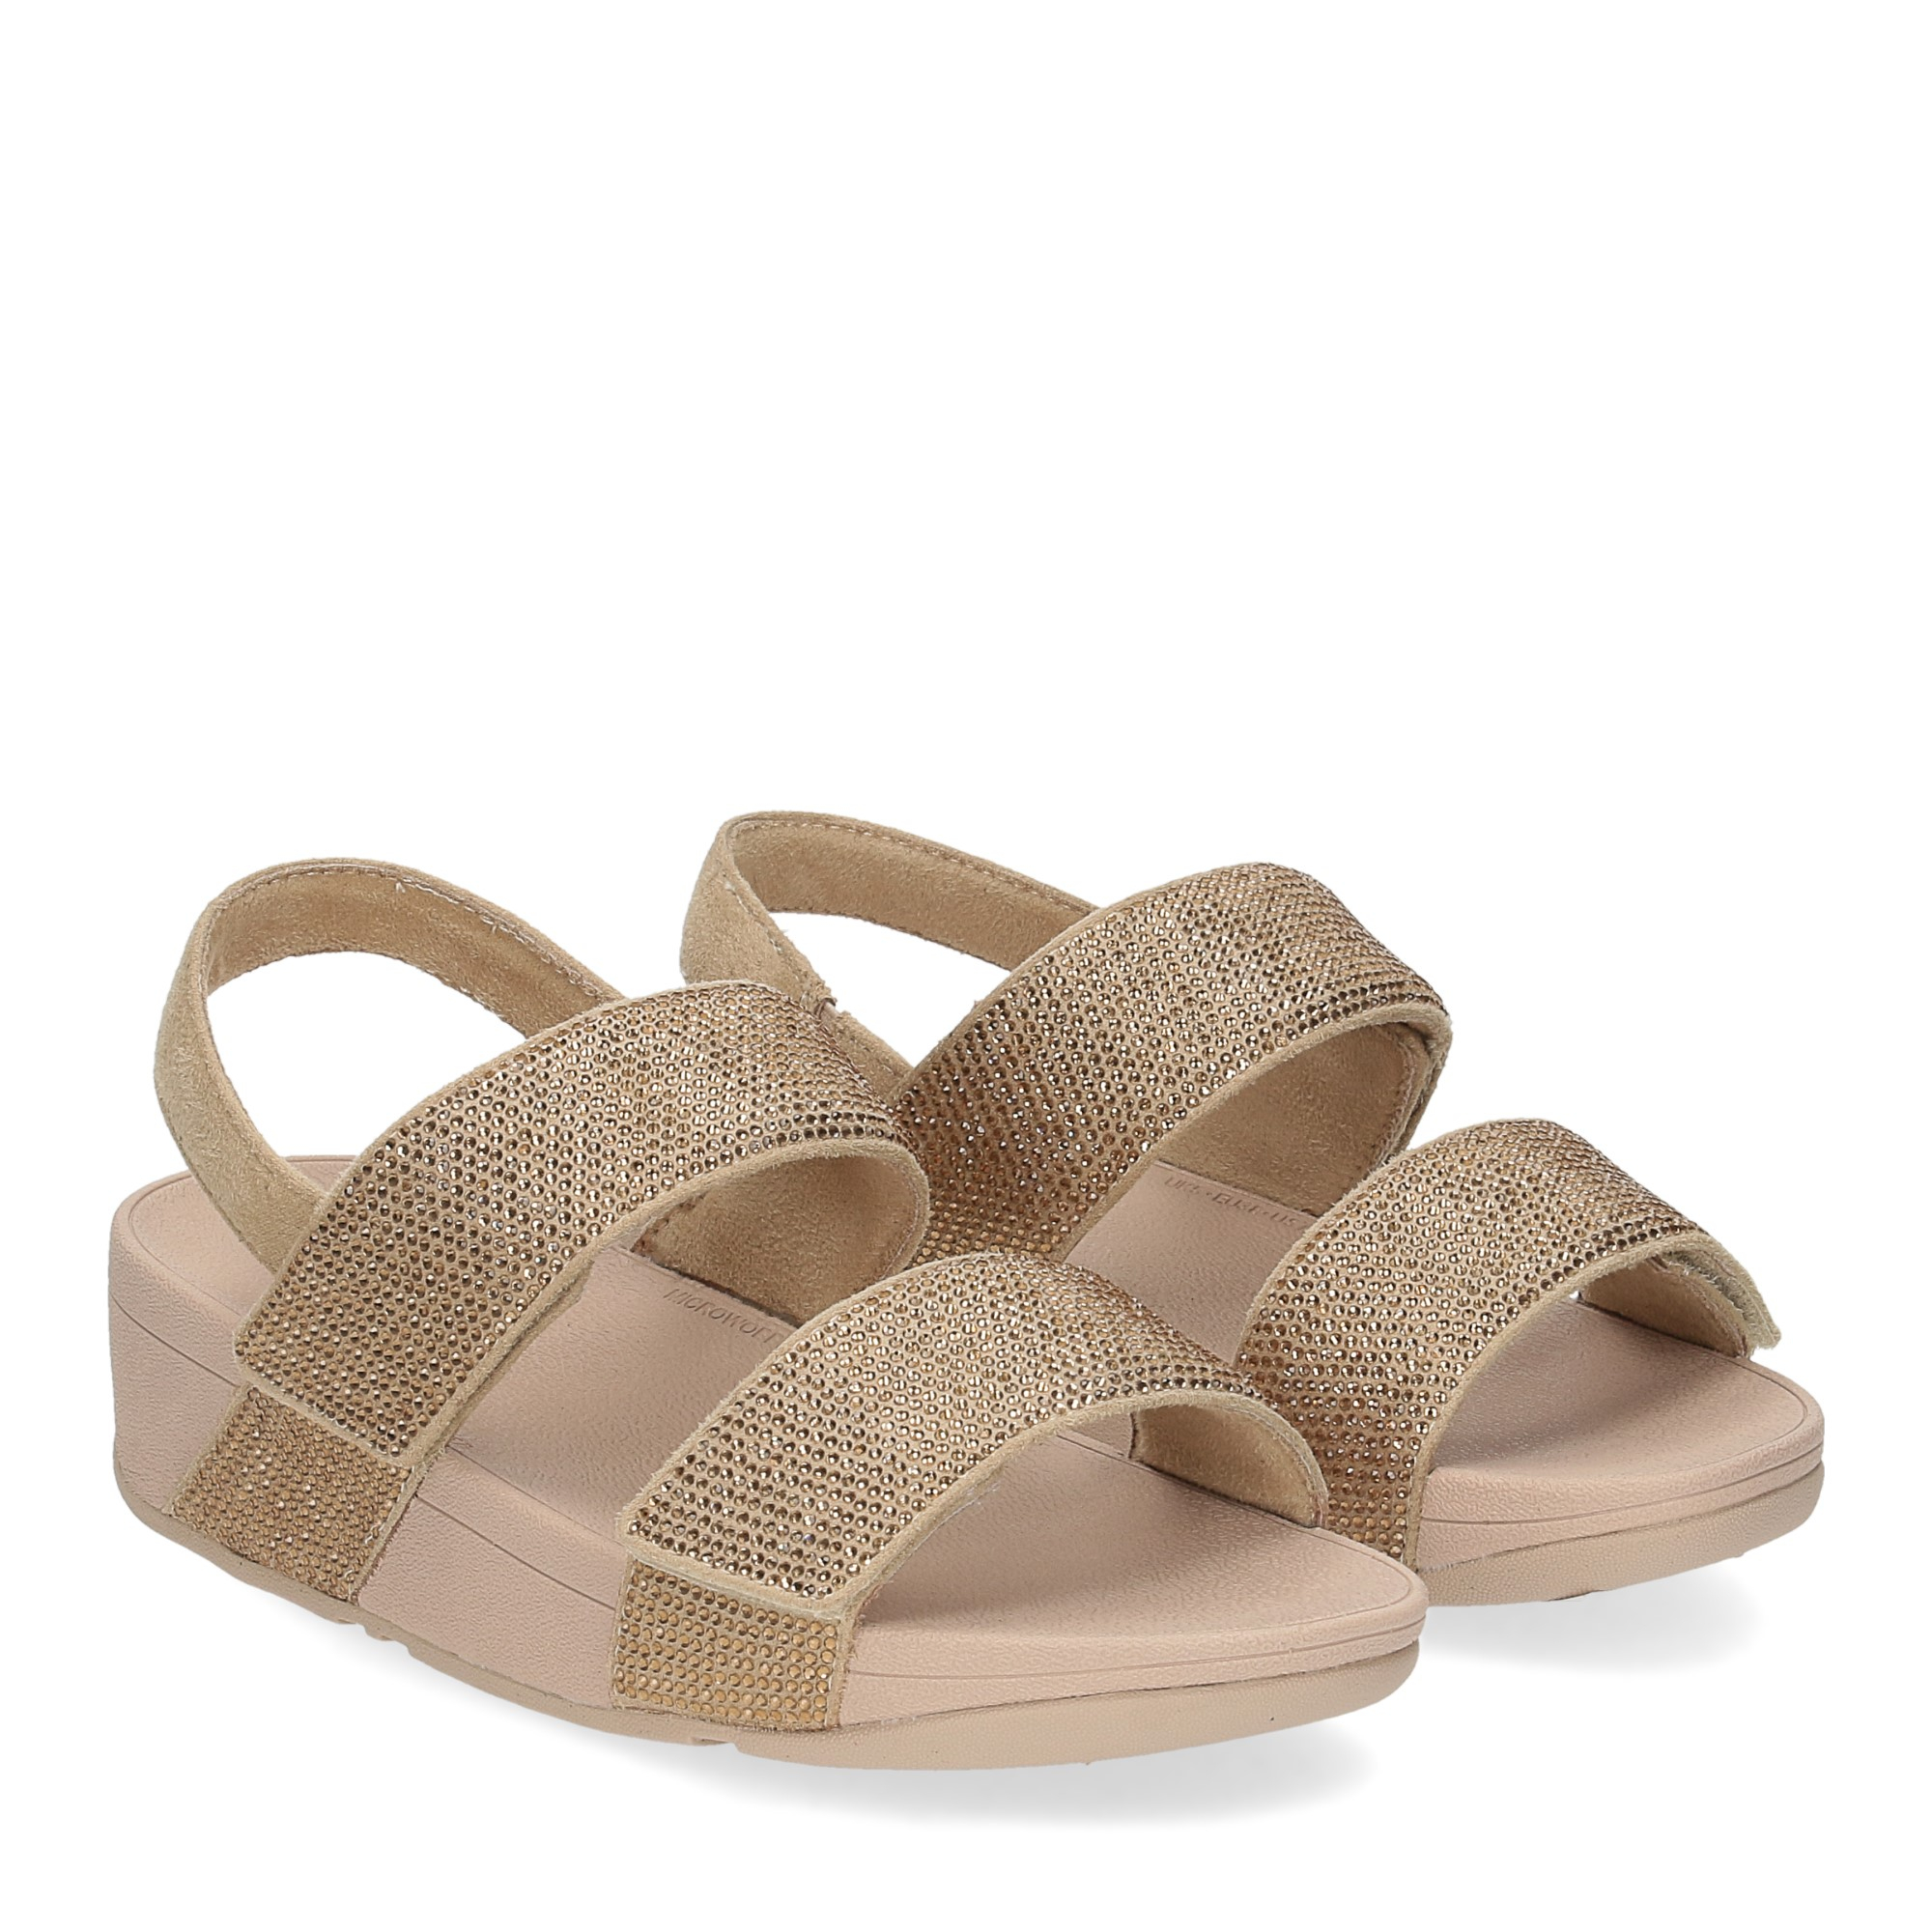 Fitflop Mina Crystal back strap sandals artisan gold